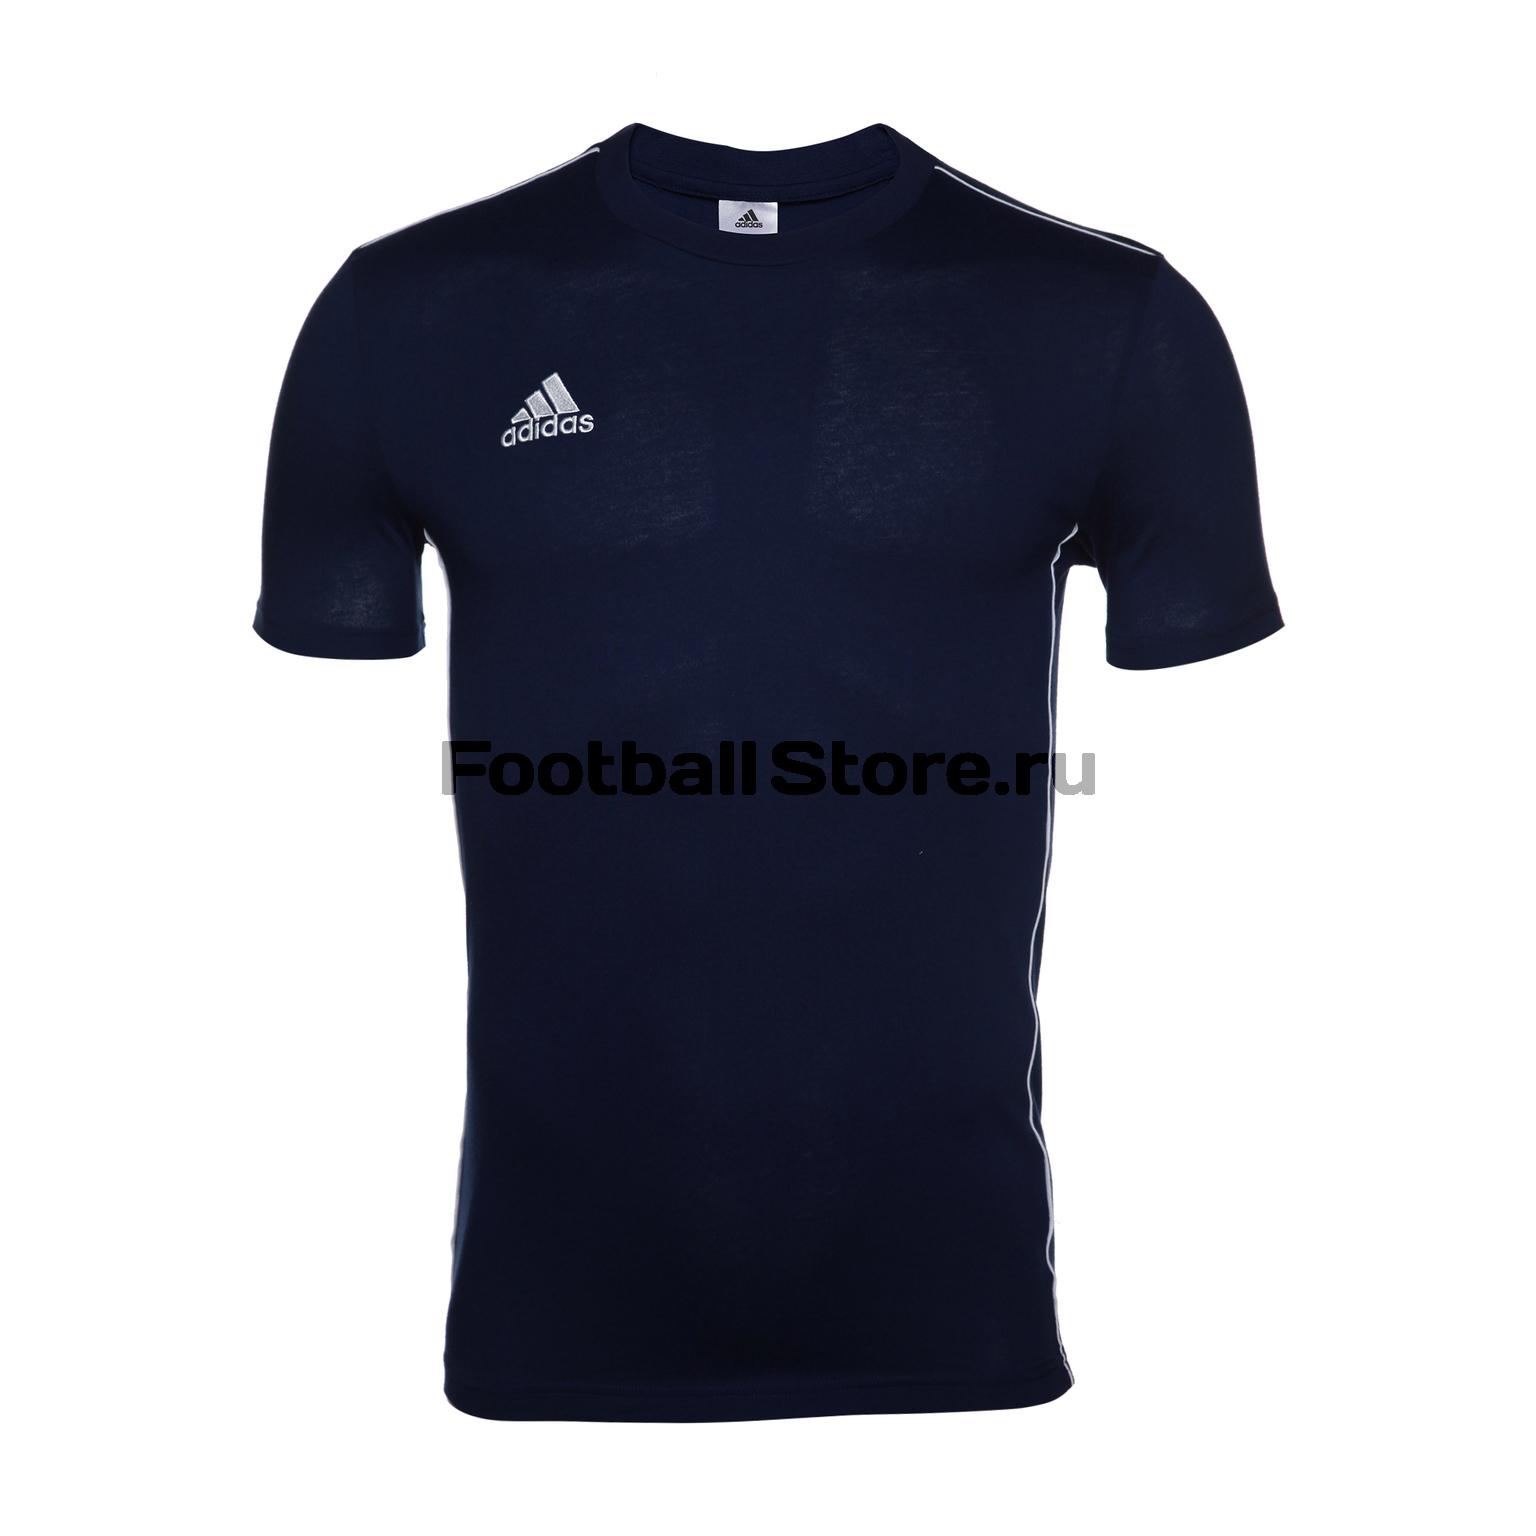 Футболка хлопковая Adidas Core18 Tee CV3981 все цены